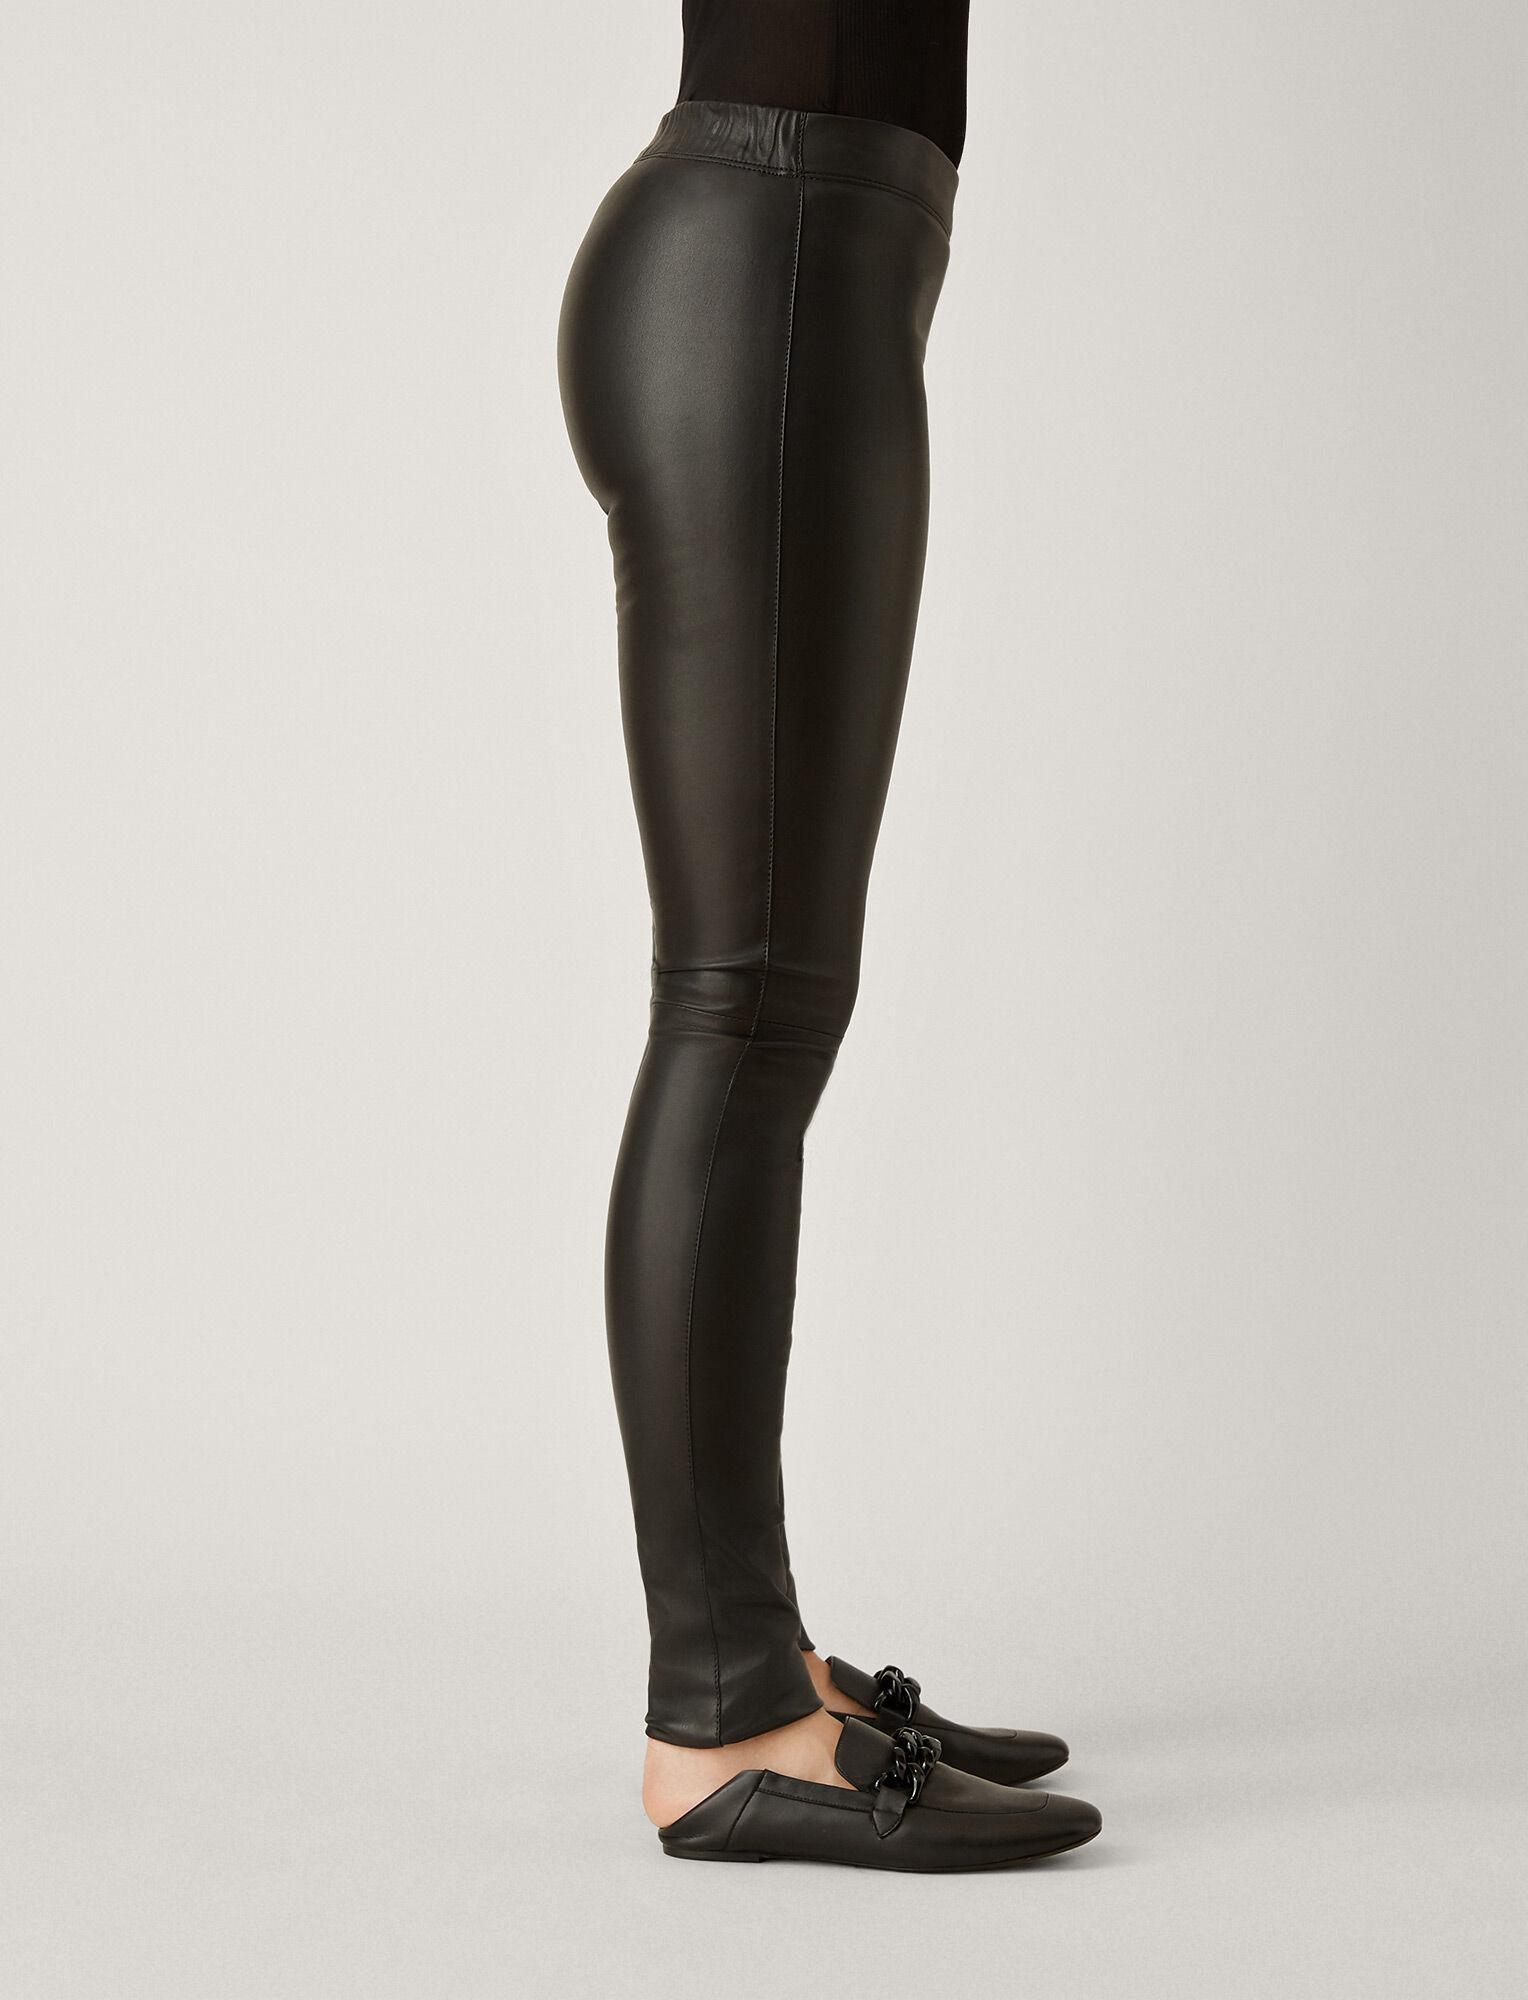 Joseph, Stretch Leather Legging, in BLACK